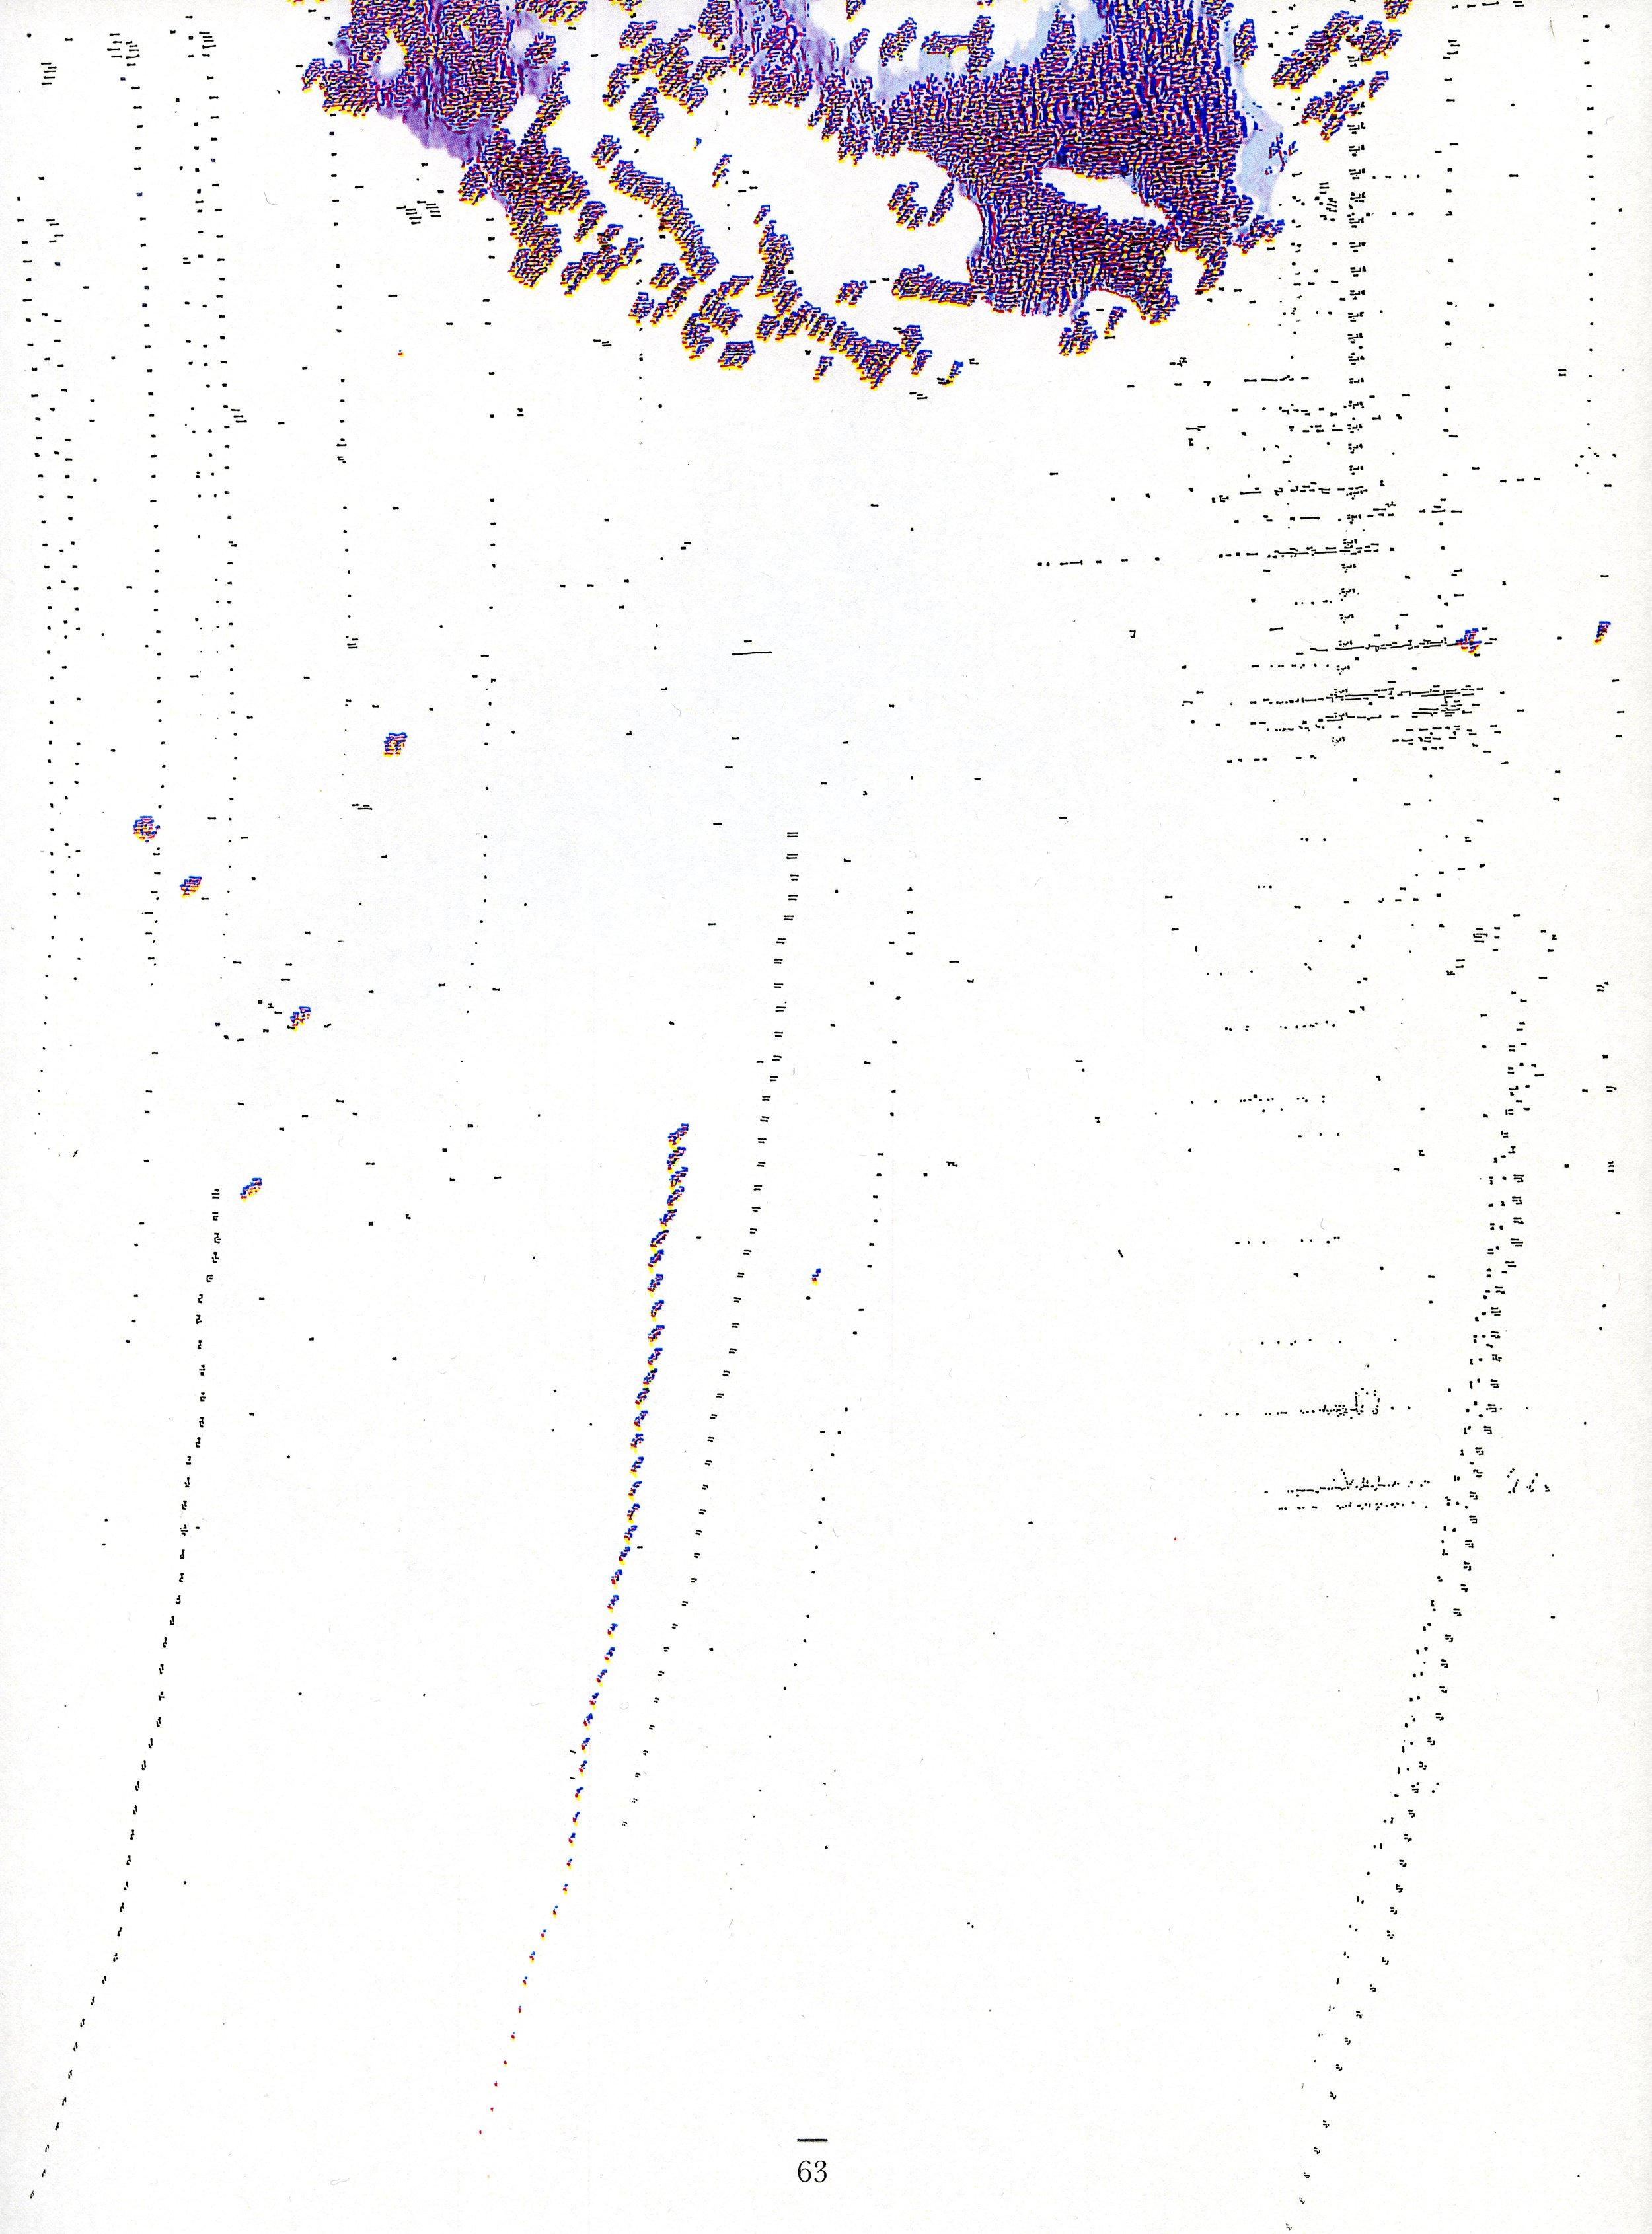 Maakbaarheid014.jpg